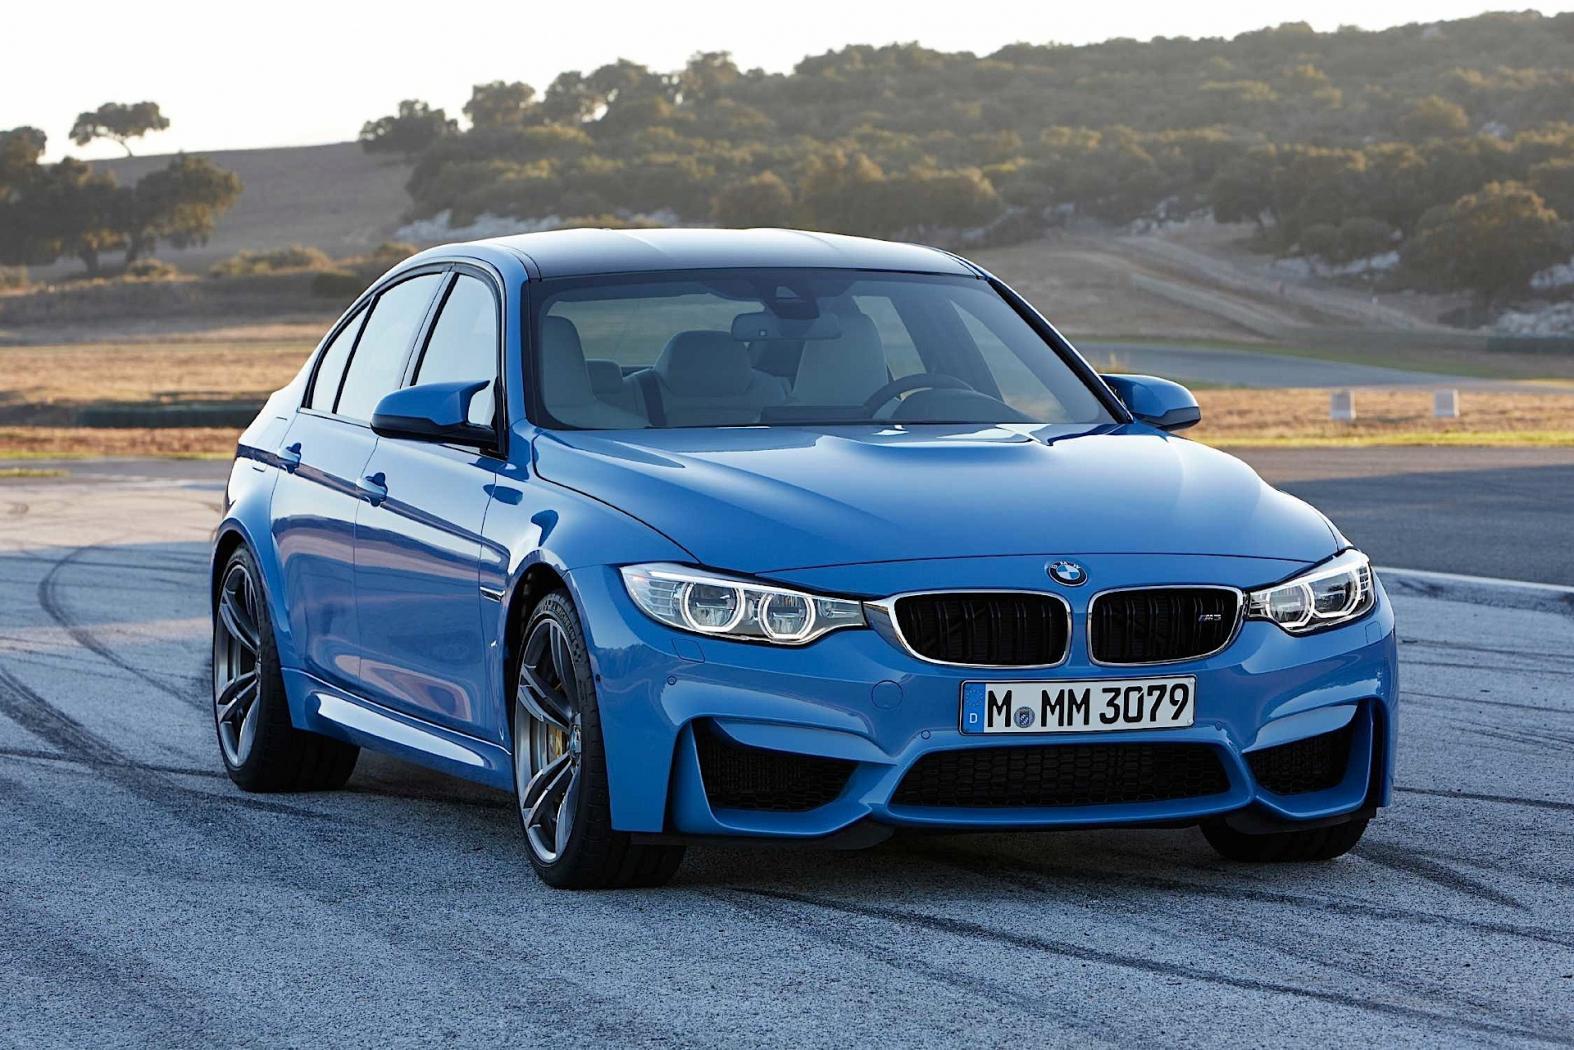 BMW-M3-F80-1.jpeg